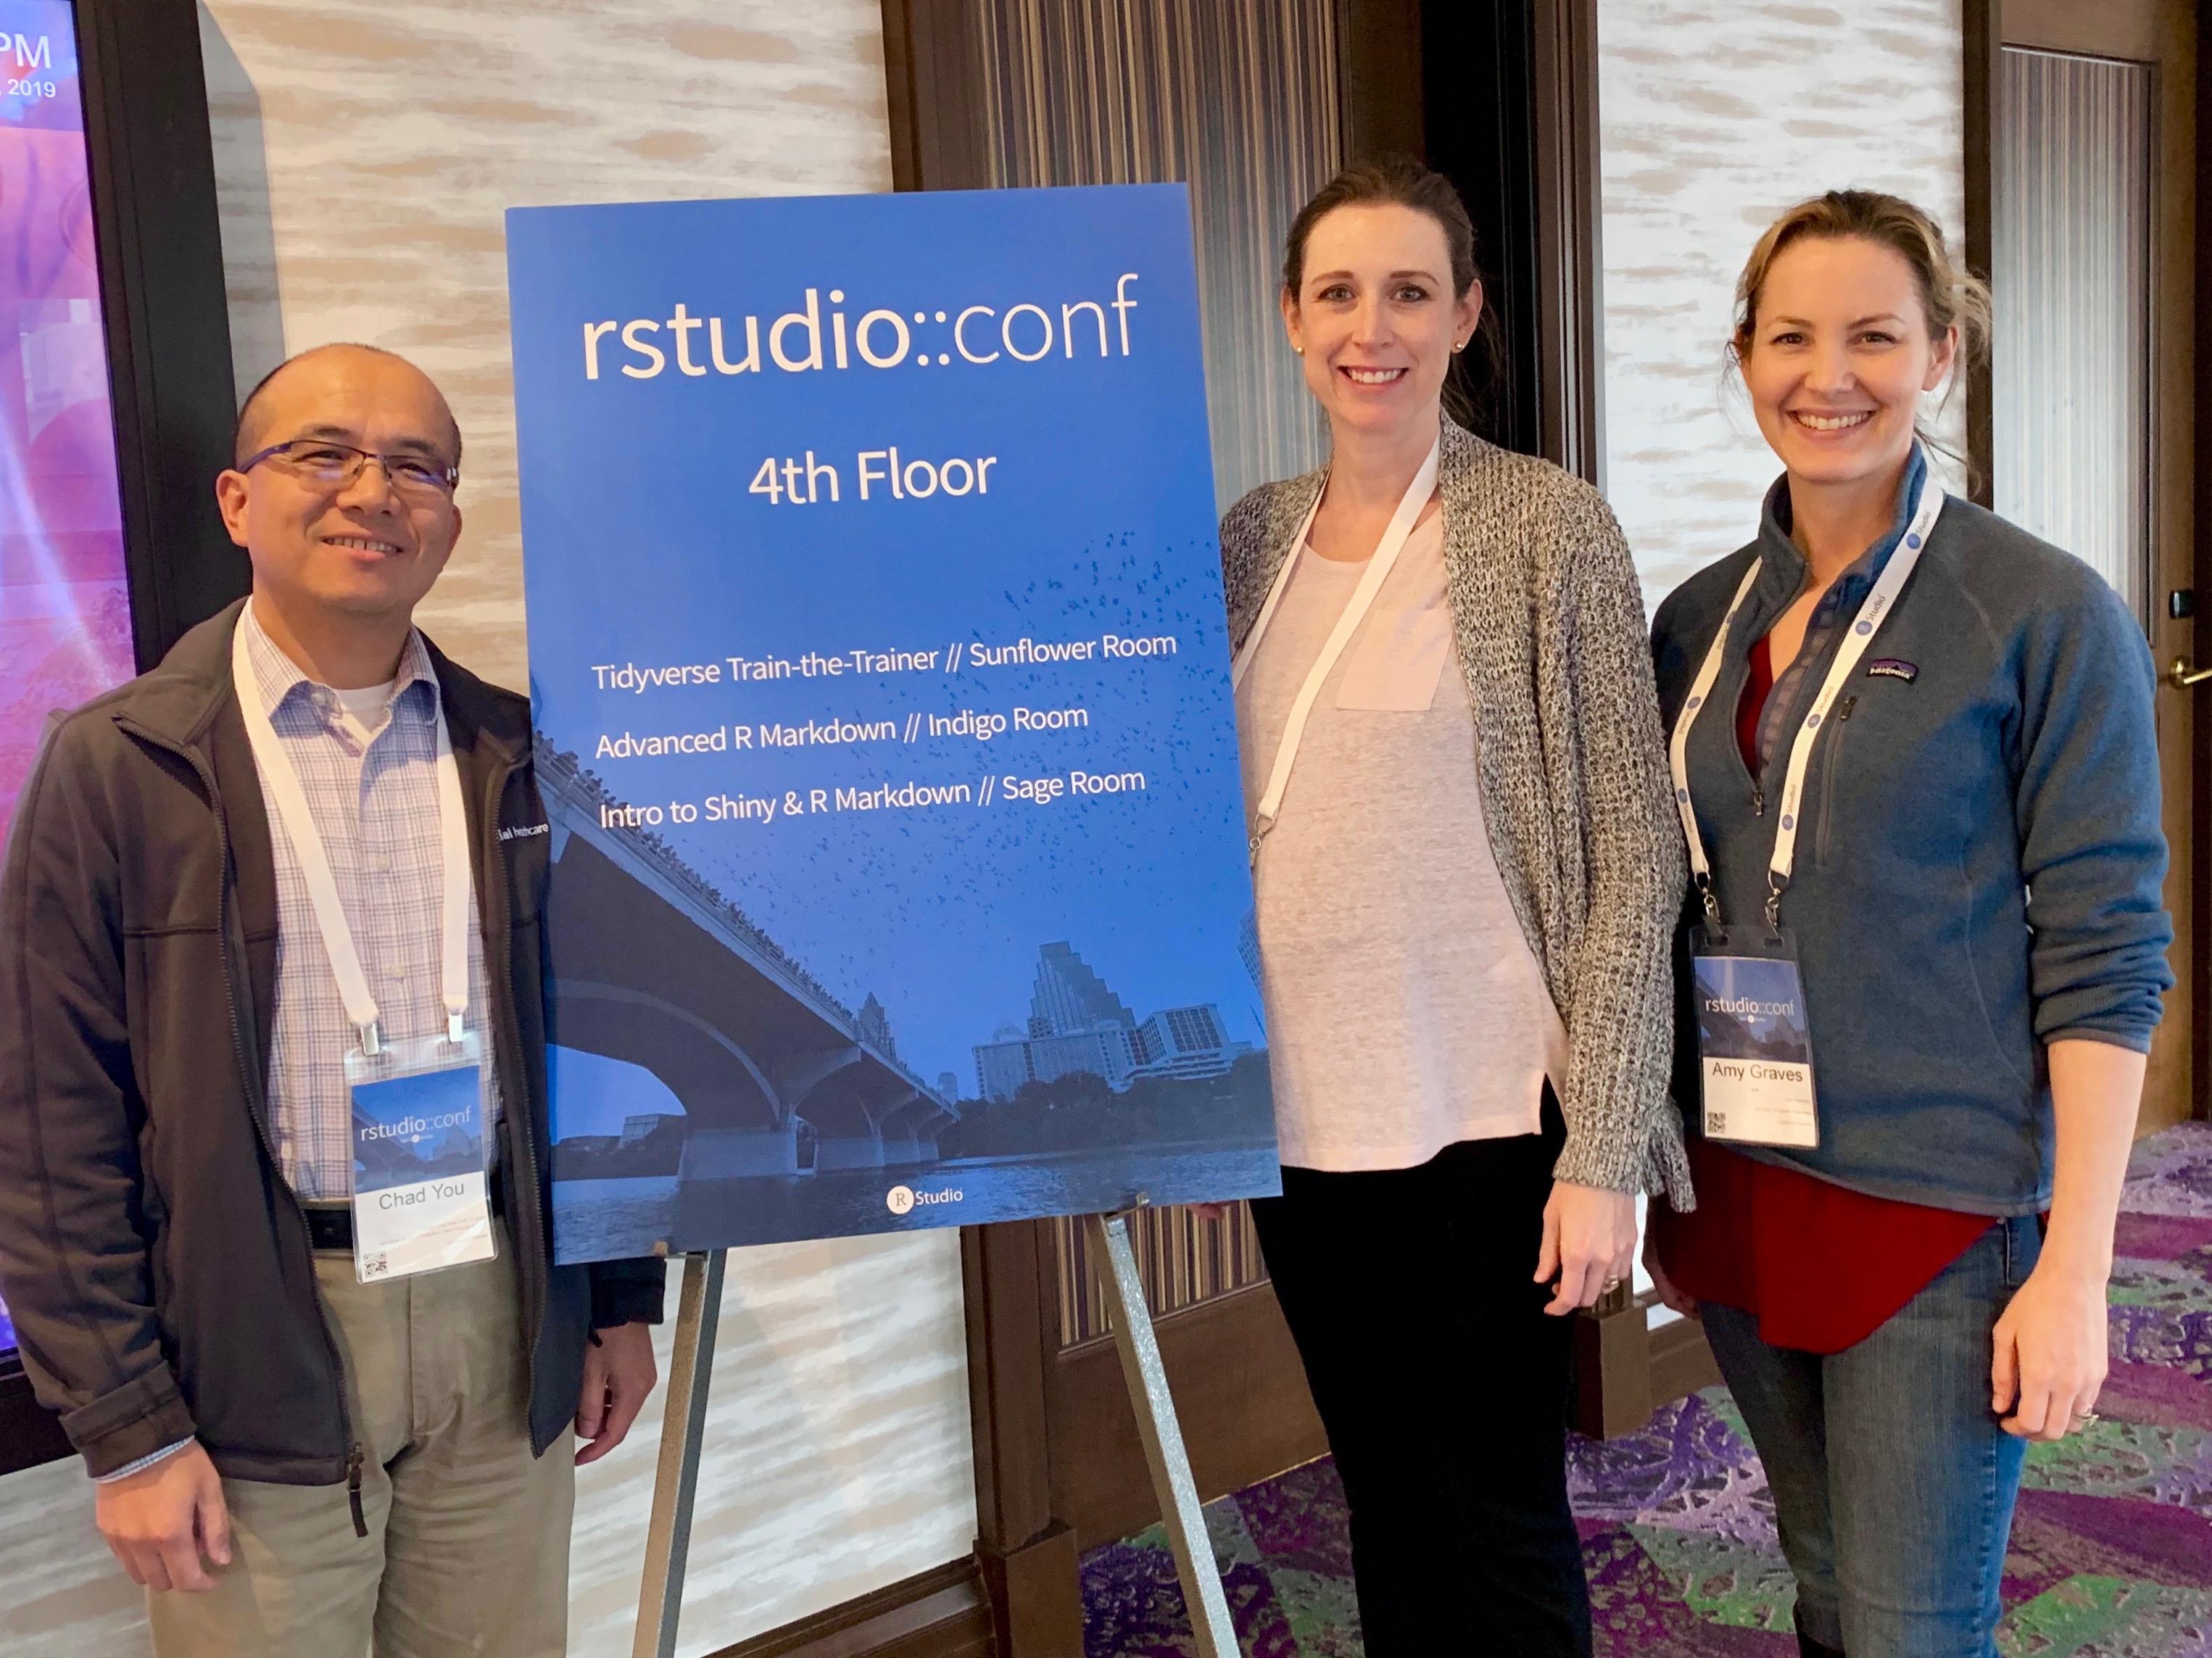 Rstudio Conference 2019